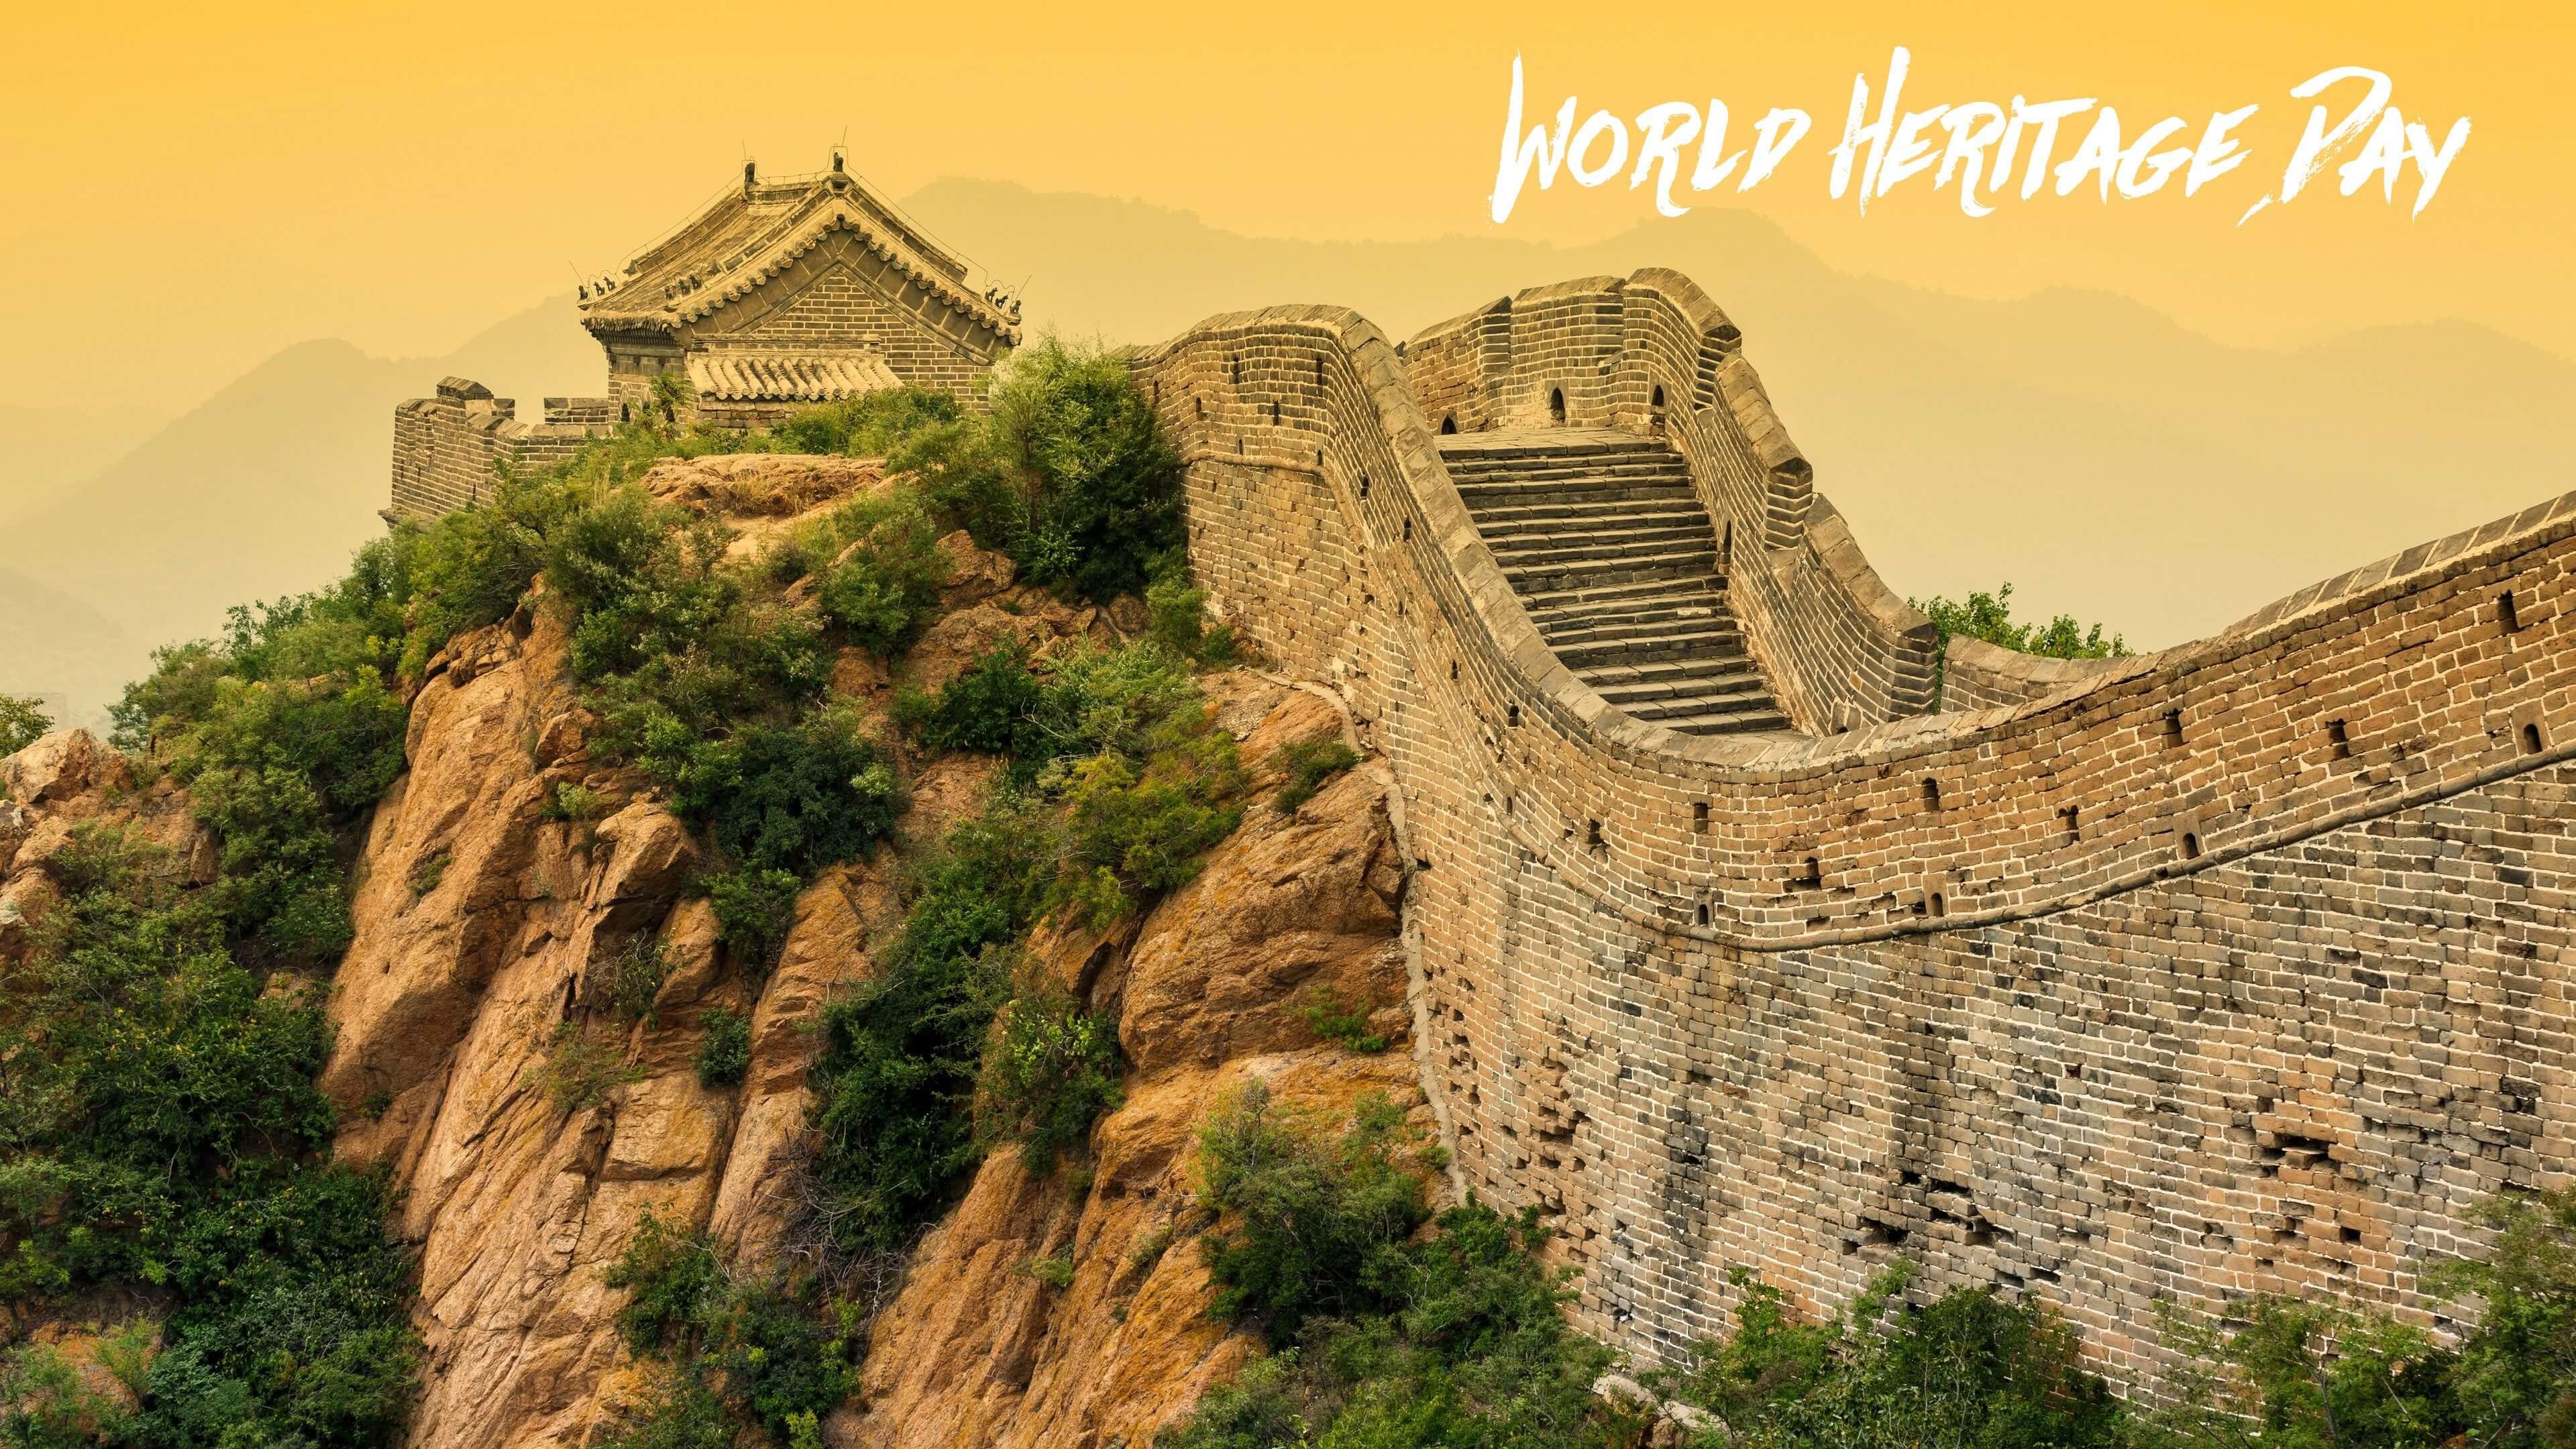 world heritage day 7 wonders great wall of china hd wallpaper